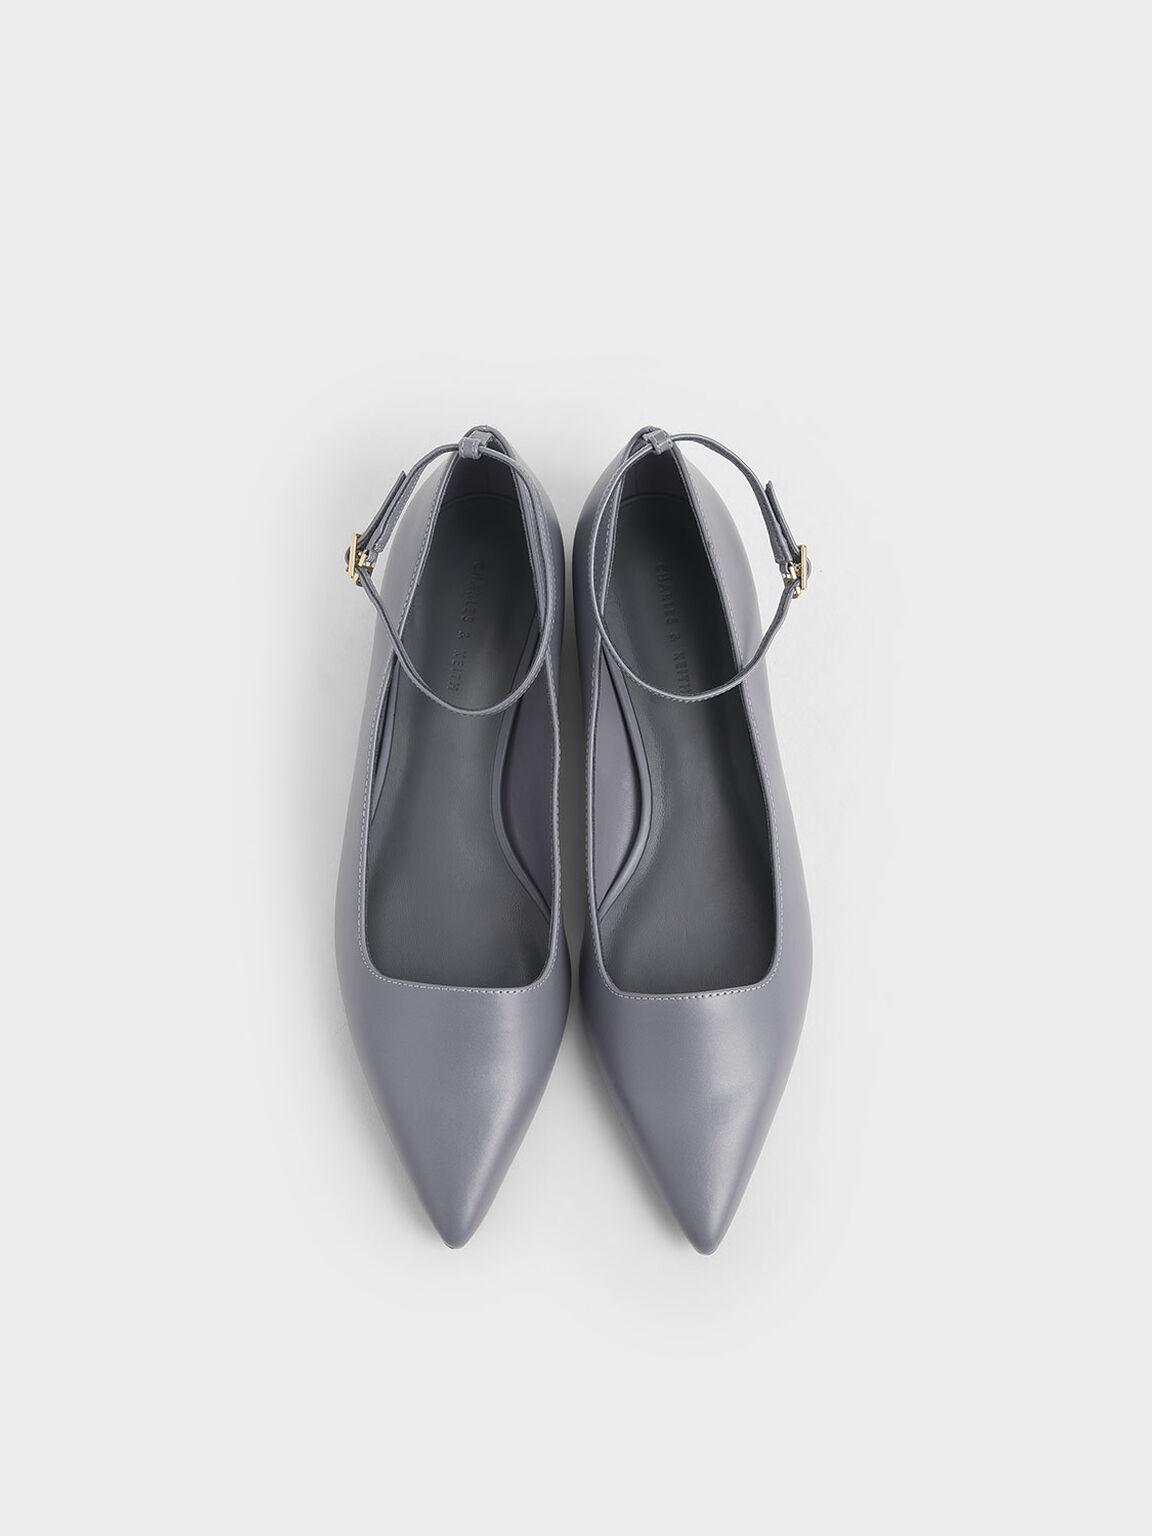 Ankle Strap Flats, Grey, hi-res